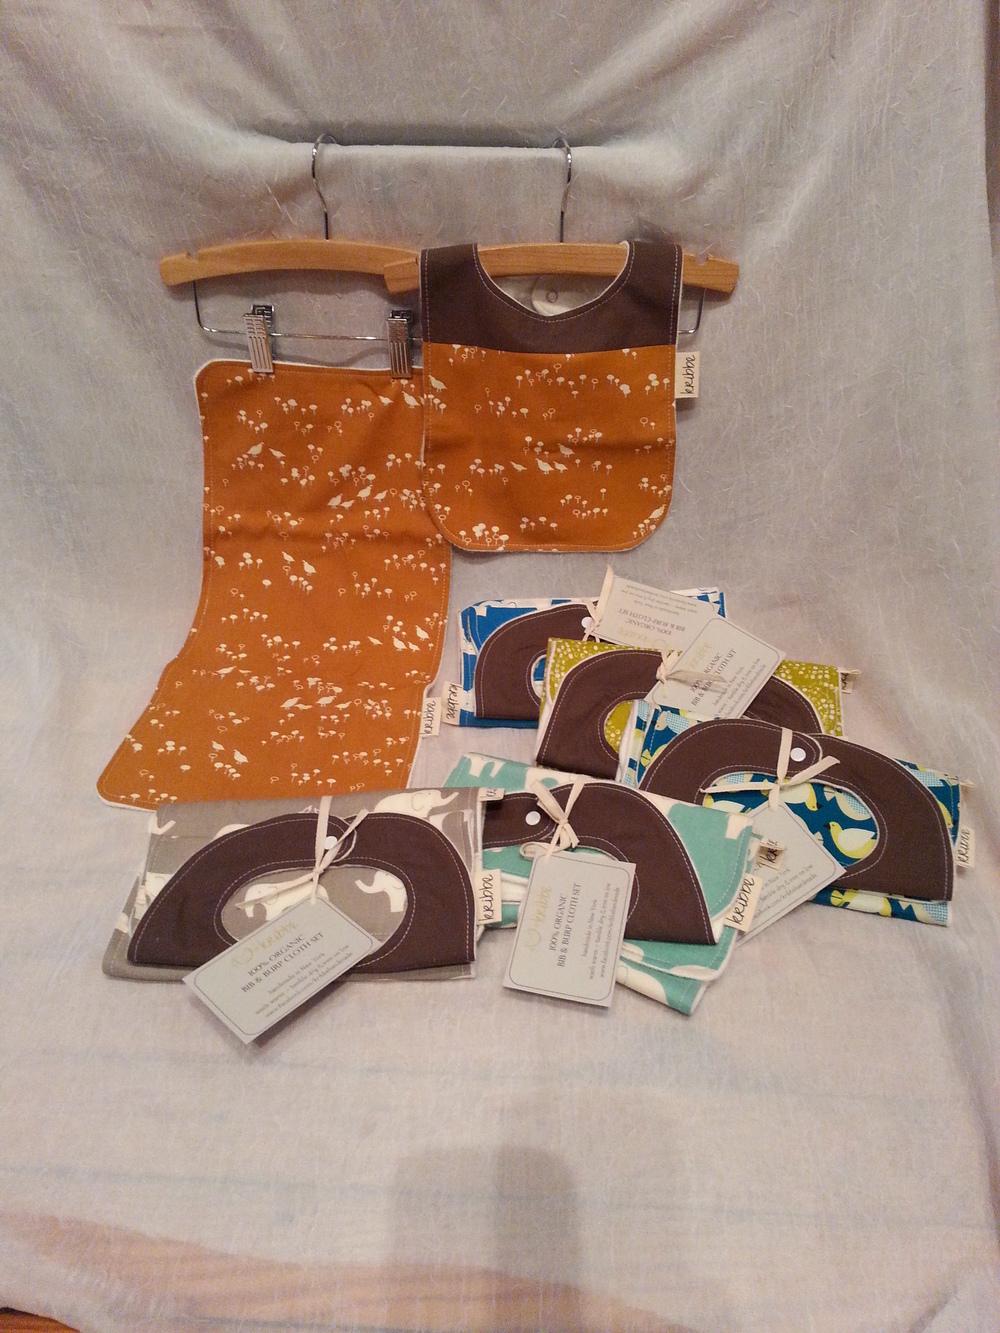 Kribbe Organic Cotton Bib & Burp Set (your choice)  Locally Handmade   $27.00    Wants 1